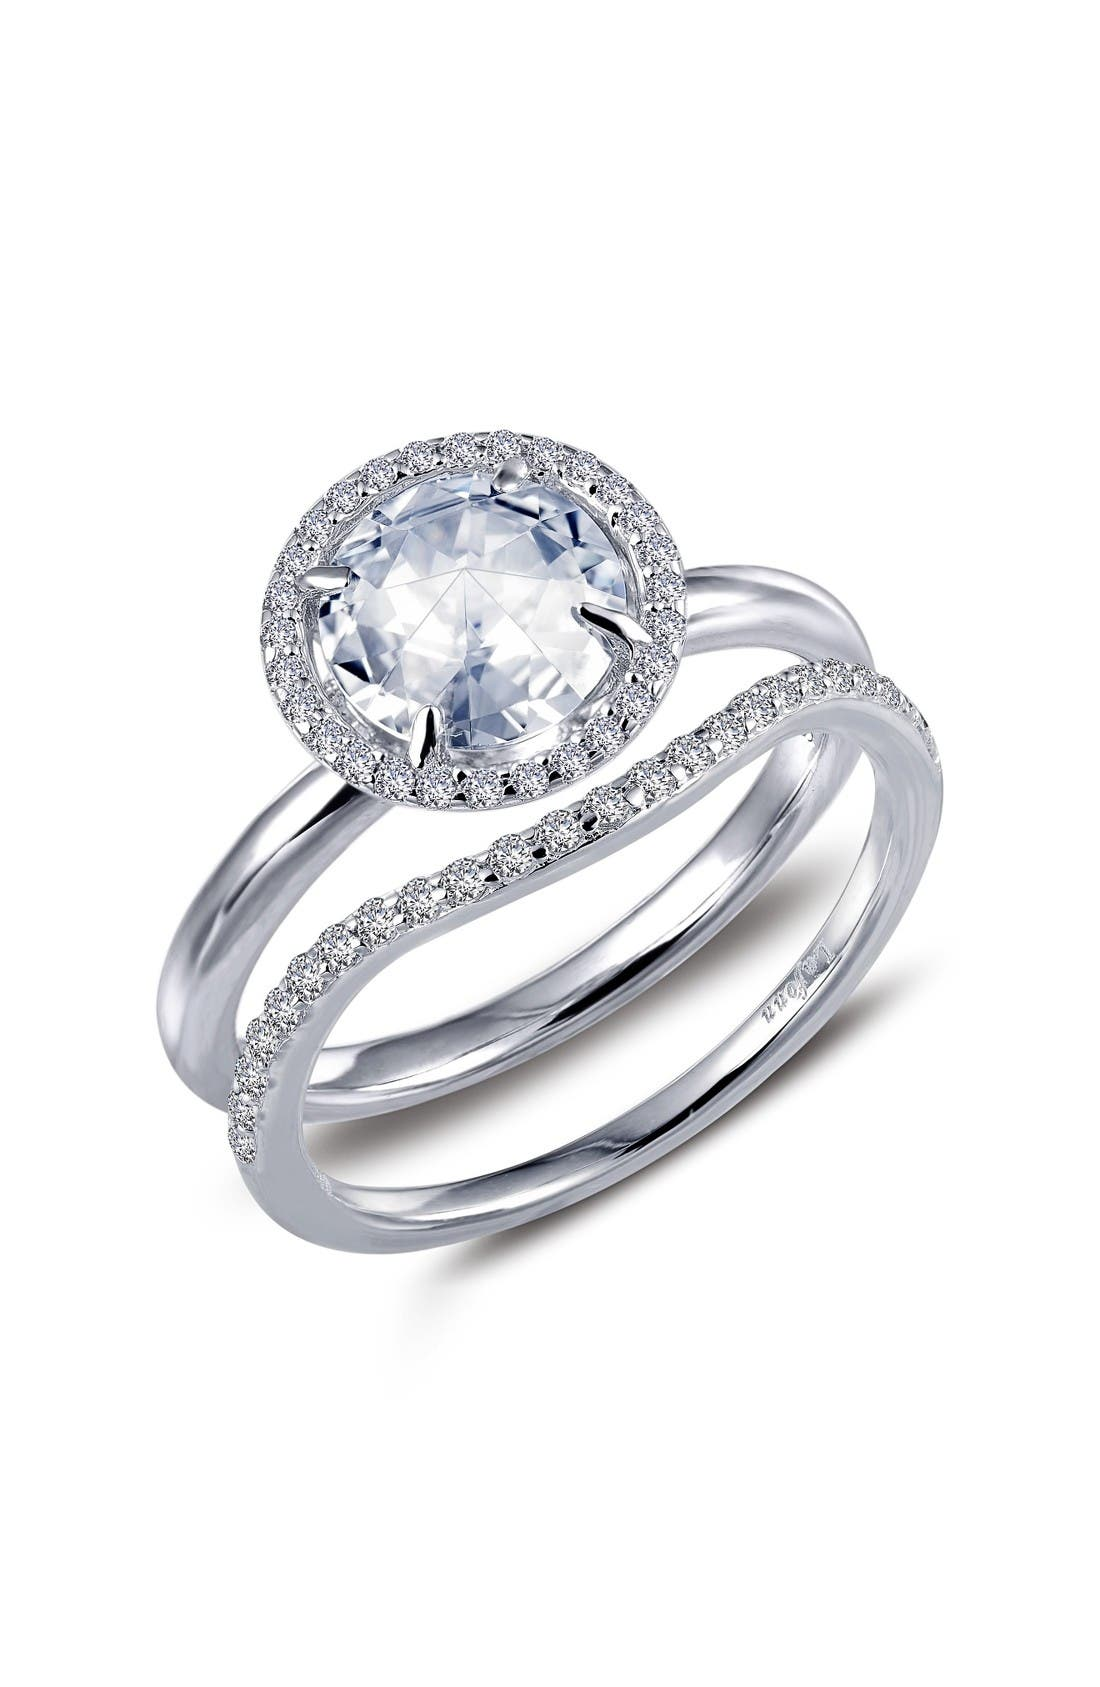 Rose Cut Simulated Diamond Ring & Band,                         Main,                         color, Silver